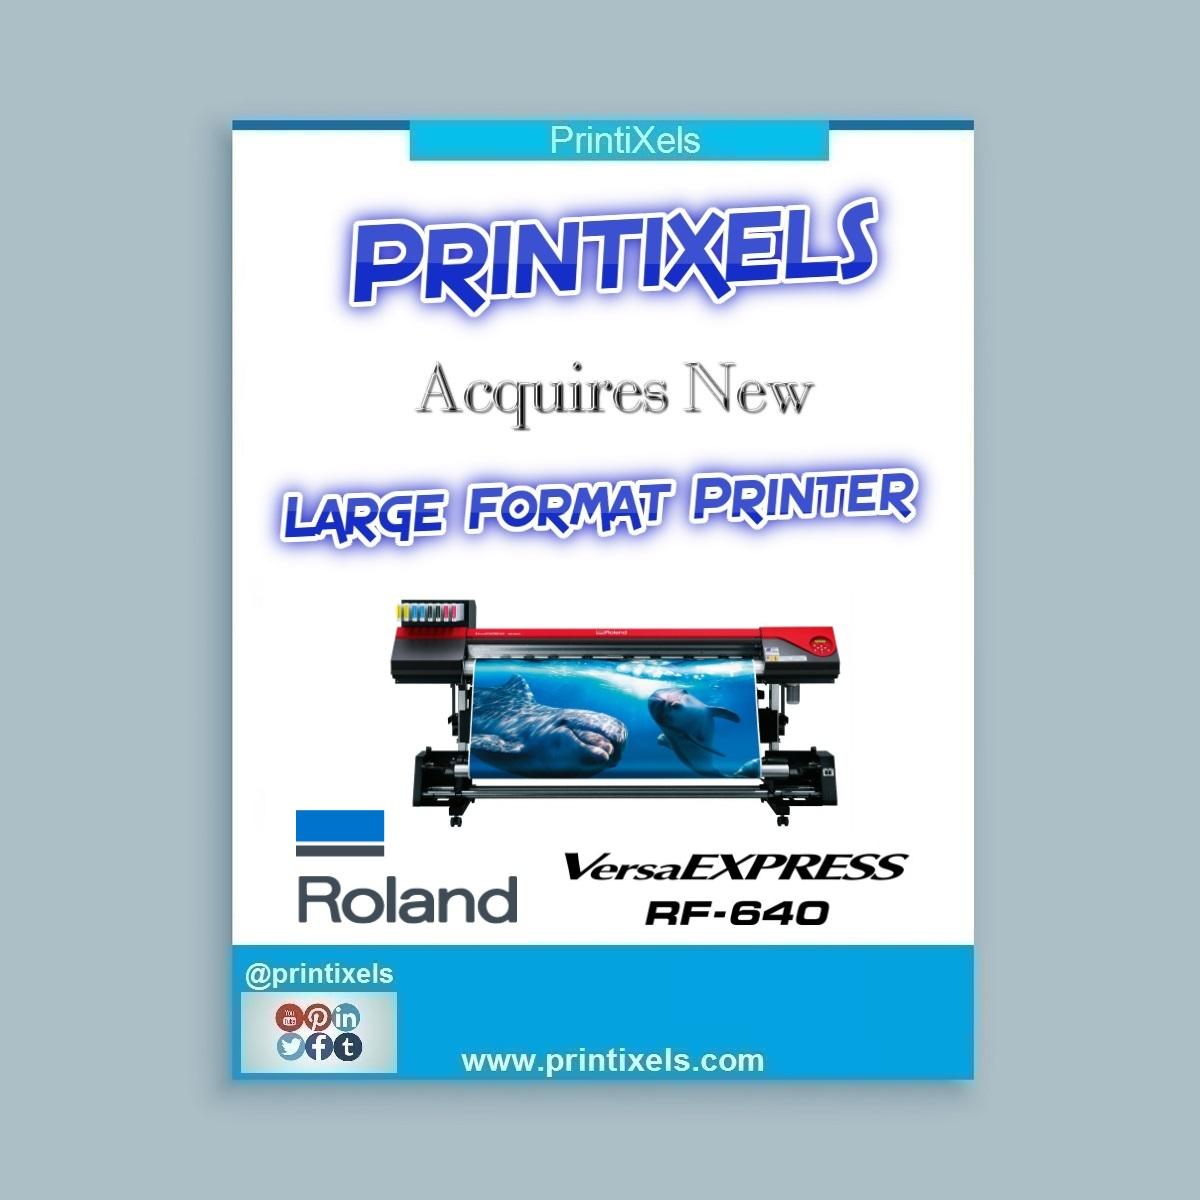 Printixels Acquires New Large Format Printer